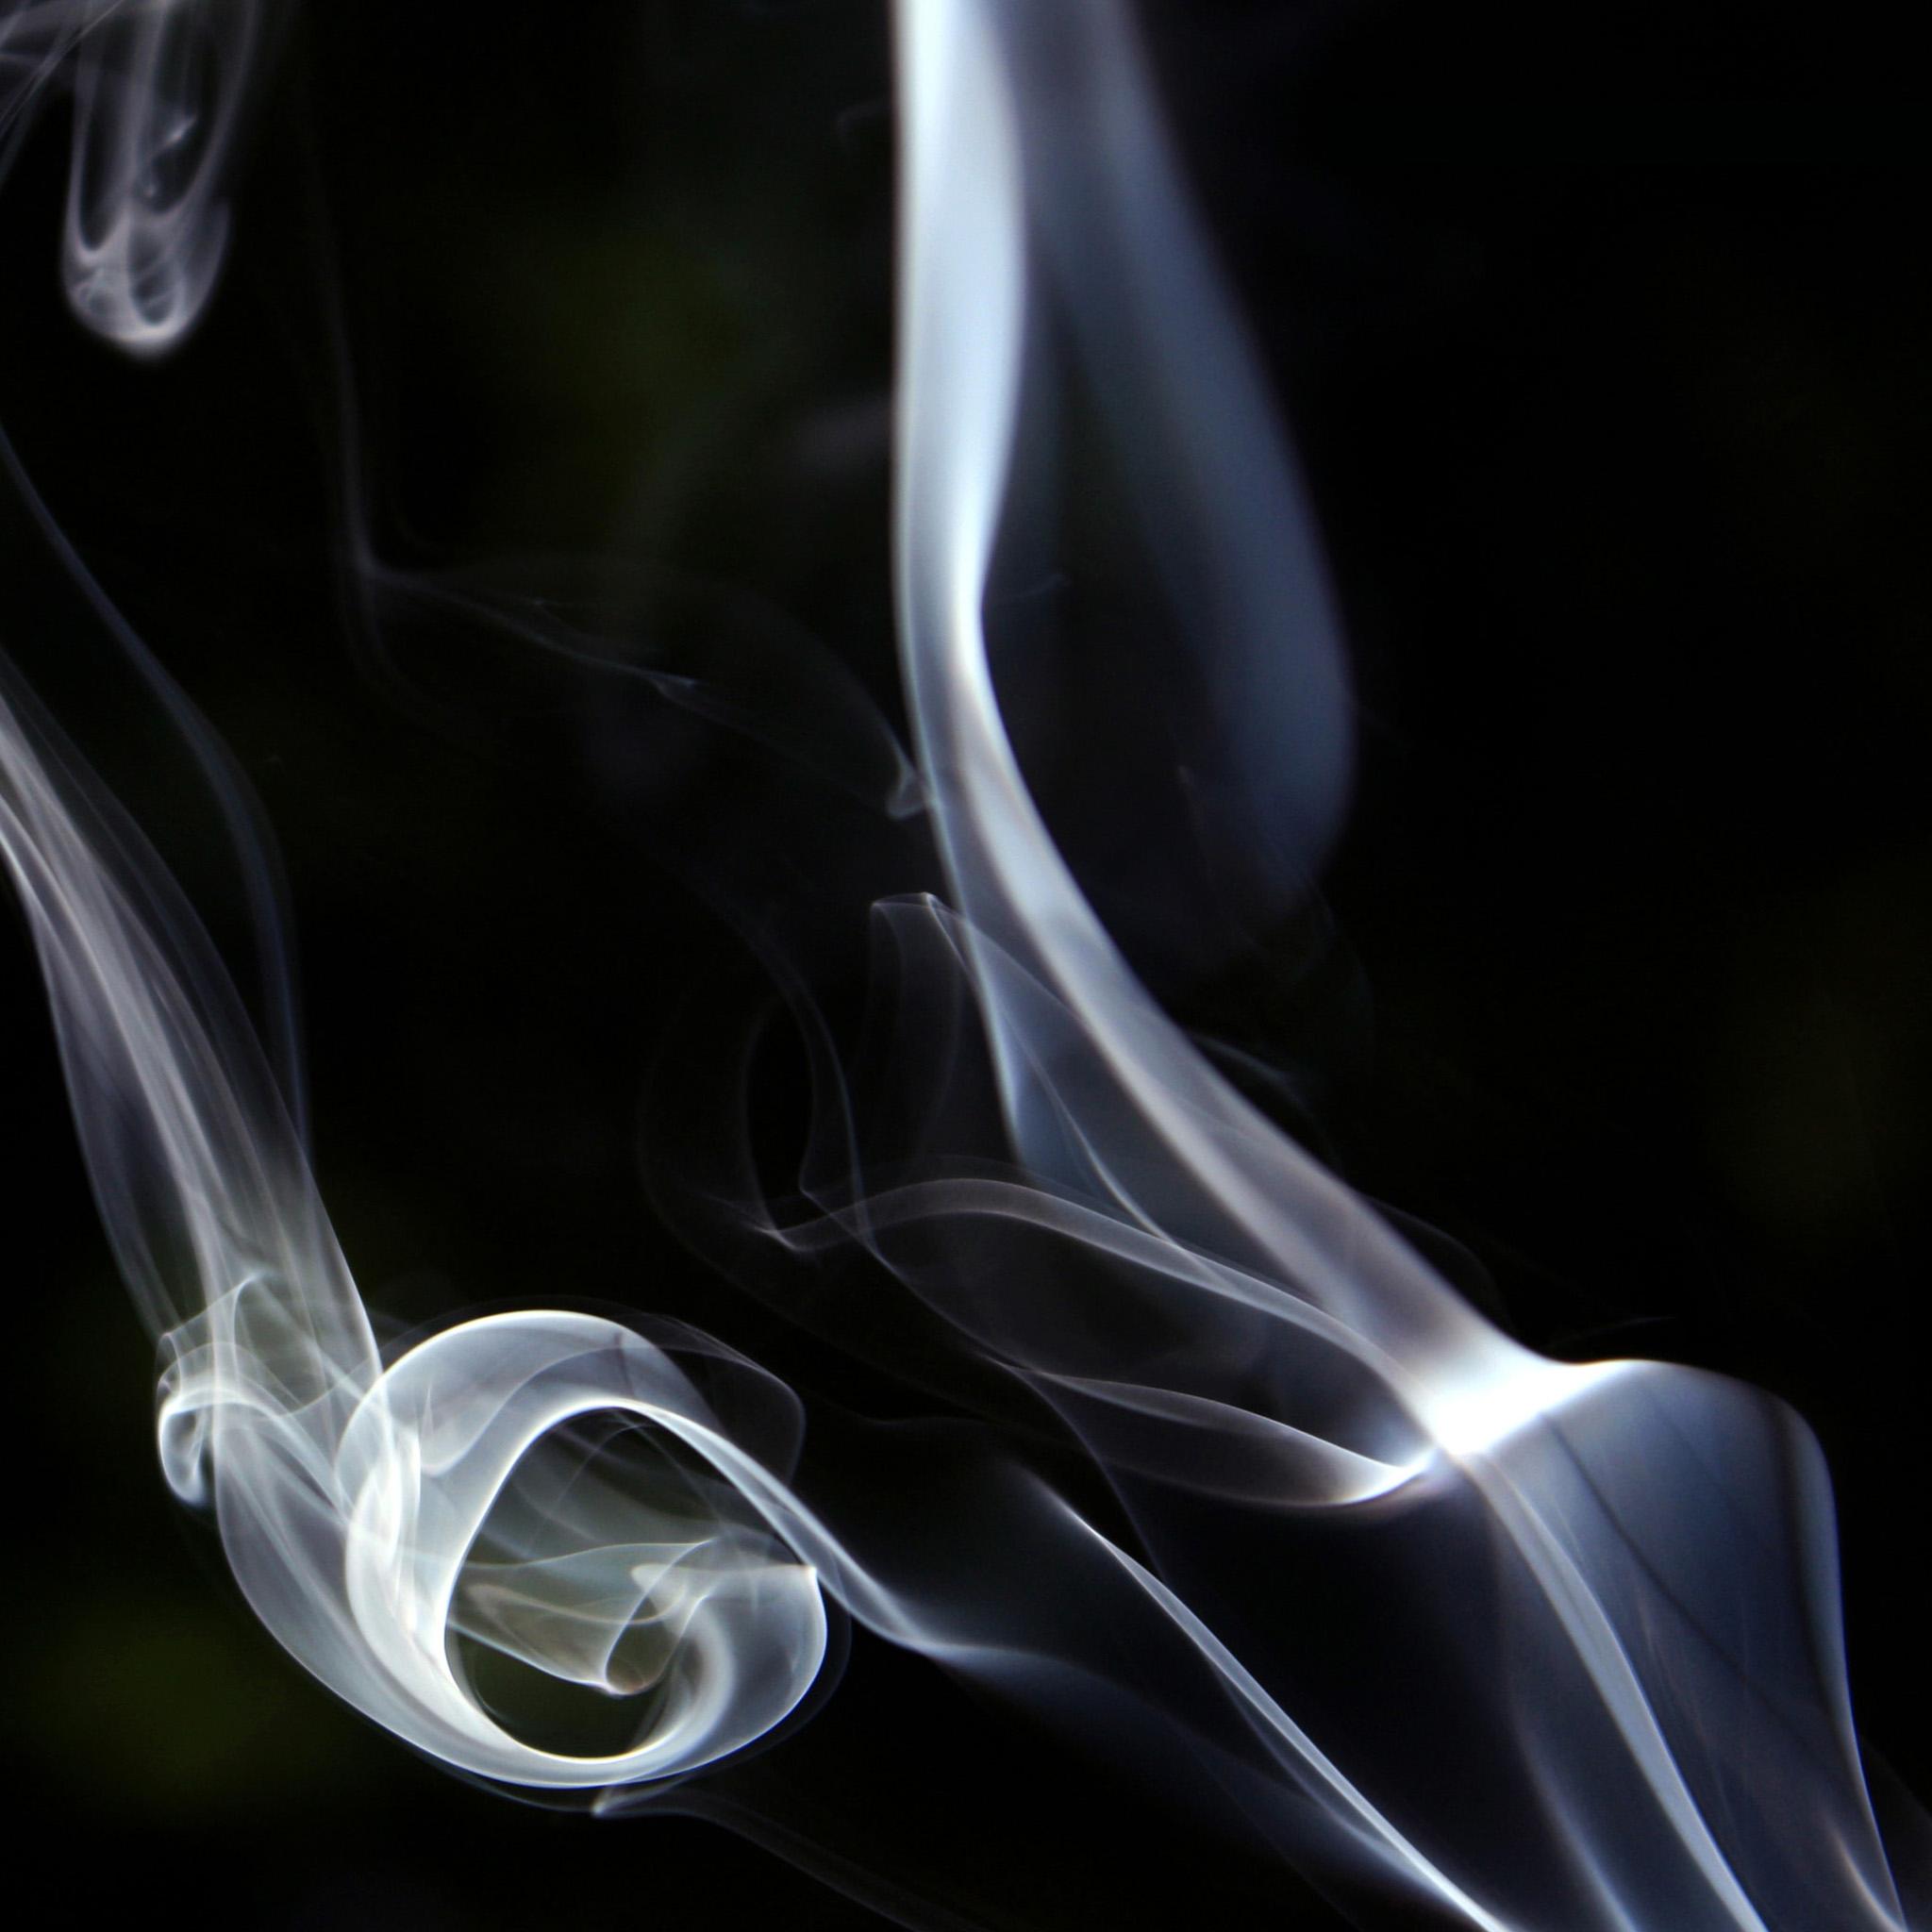 ipad smokes live wallpapers wallpapersafari